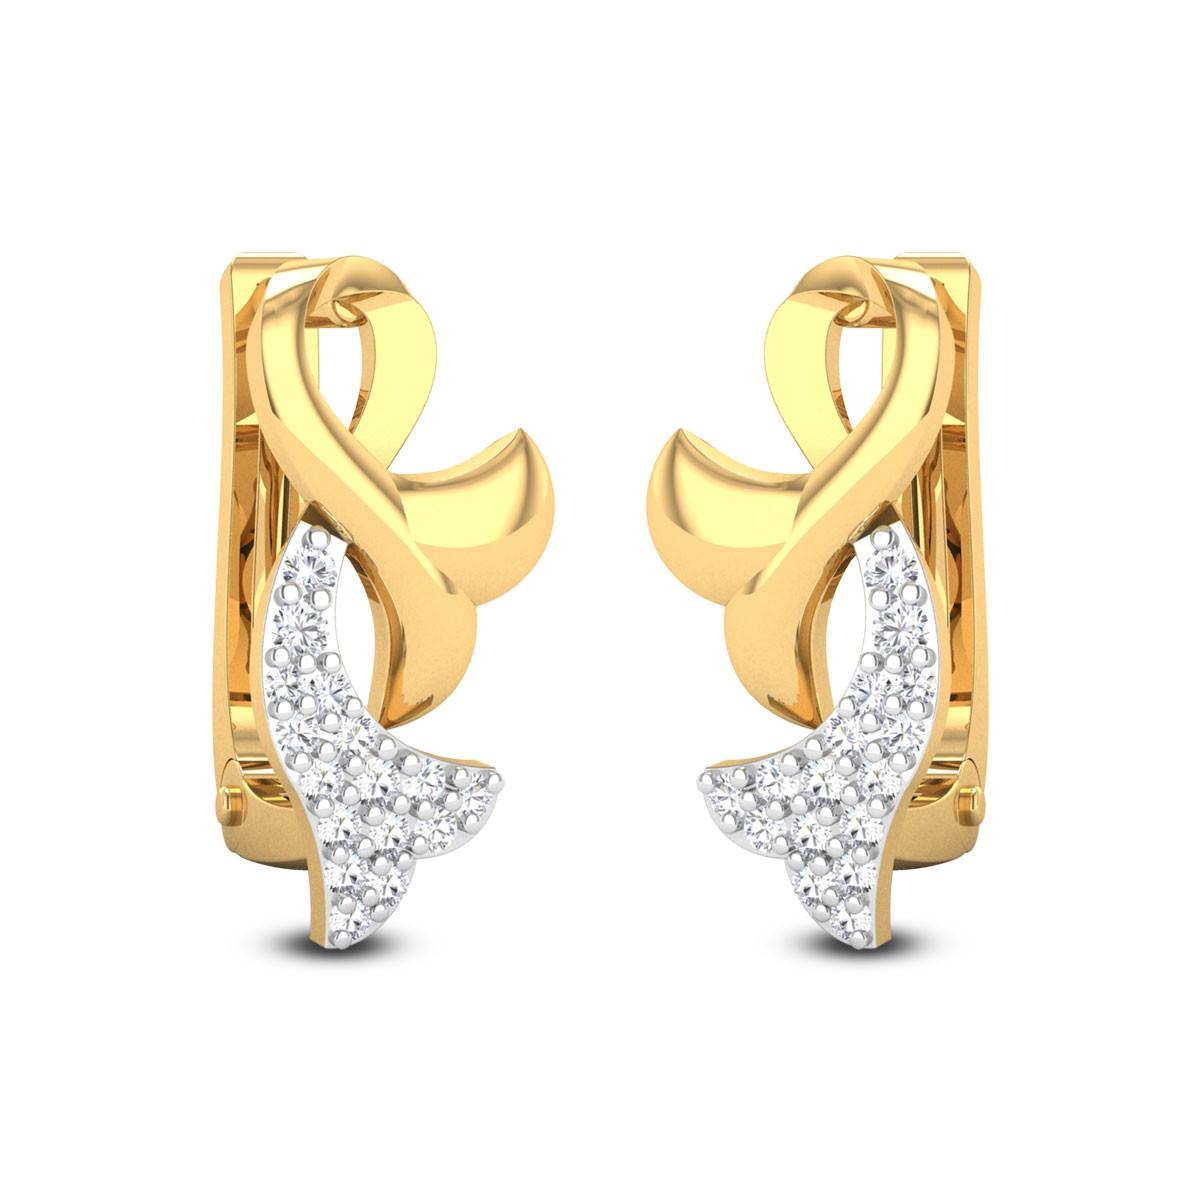 Dancing Symphony Stud Earrings